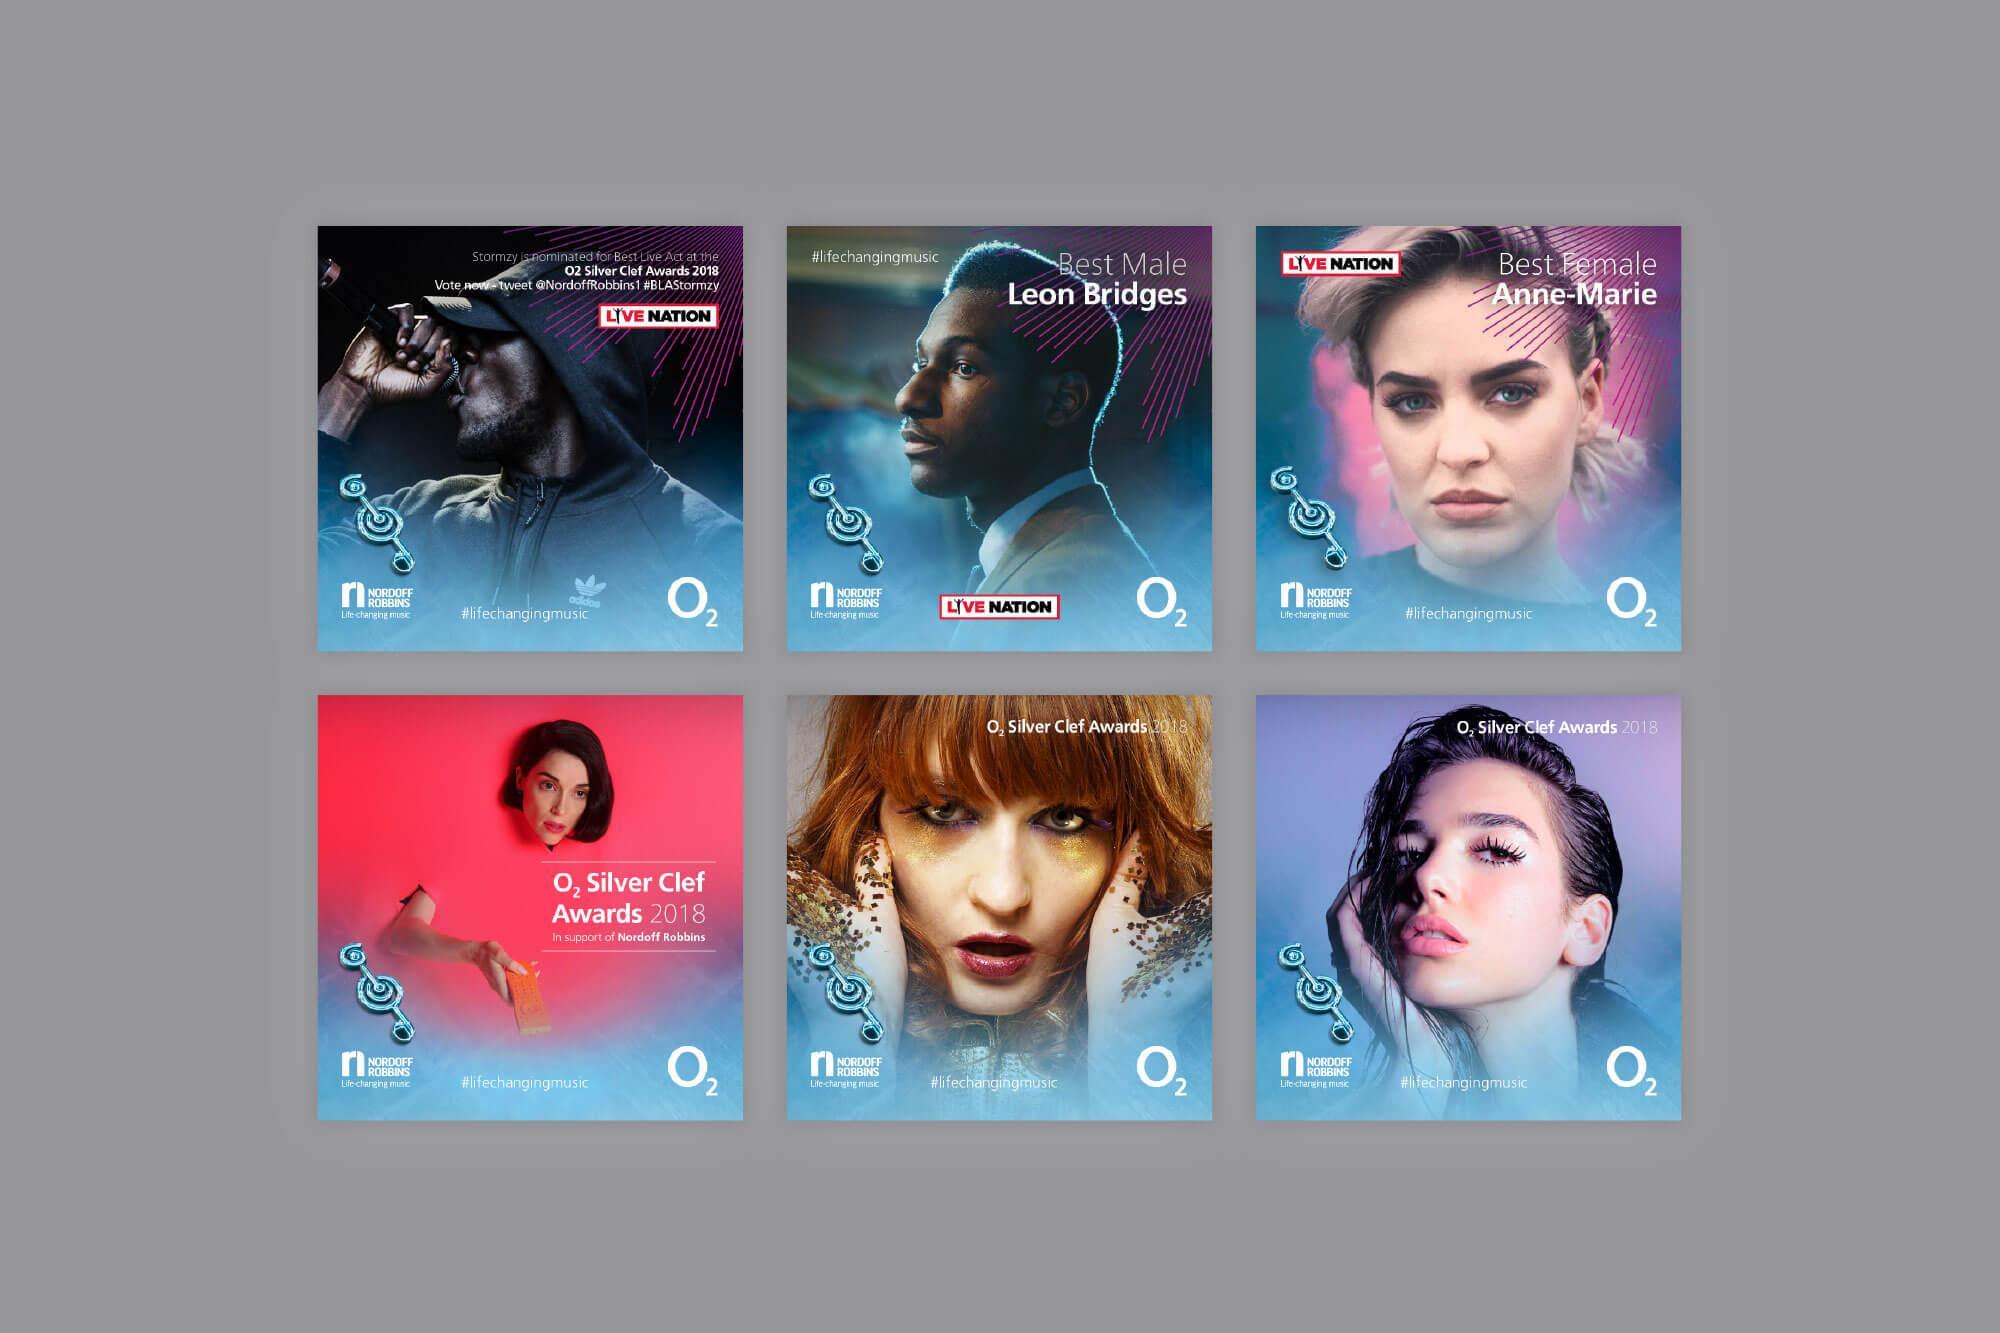 gpj-studio-o2-silver-clef-awards-brand-refresh-cs-10